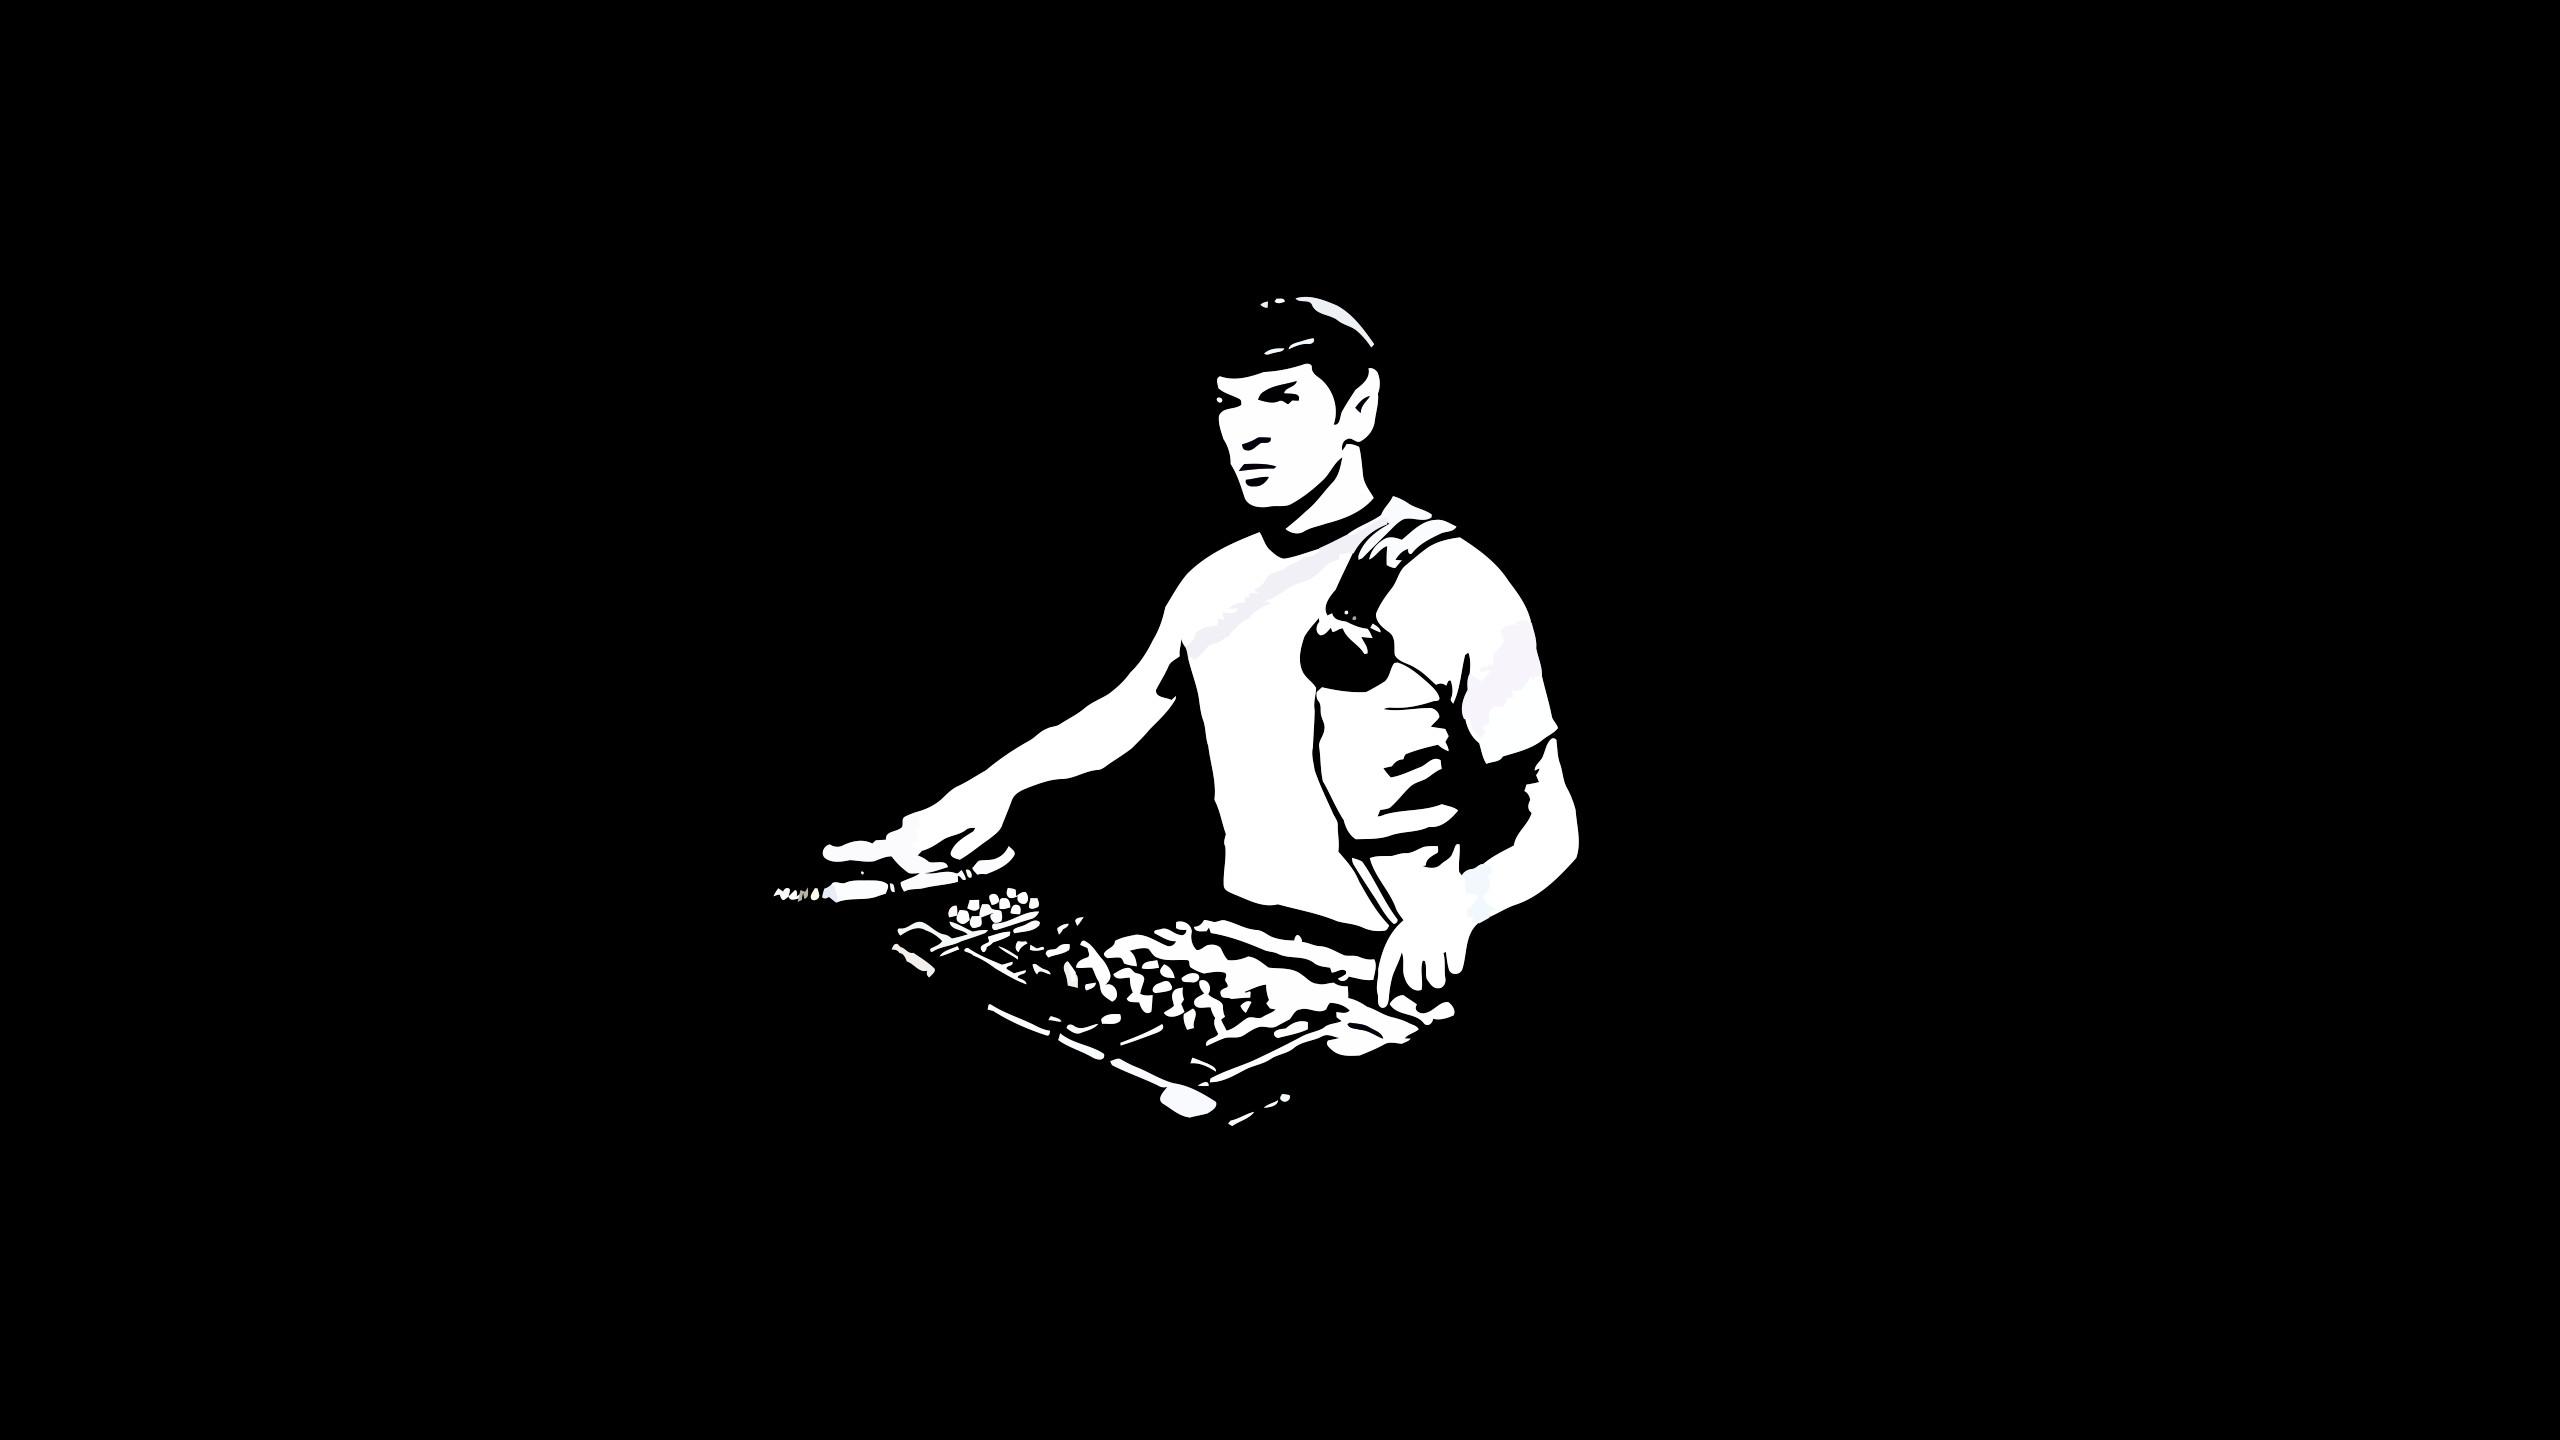 Res: 2560x1440, Spock as DJ Wallpaper